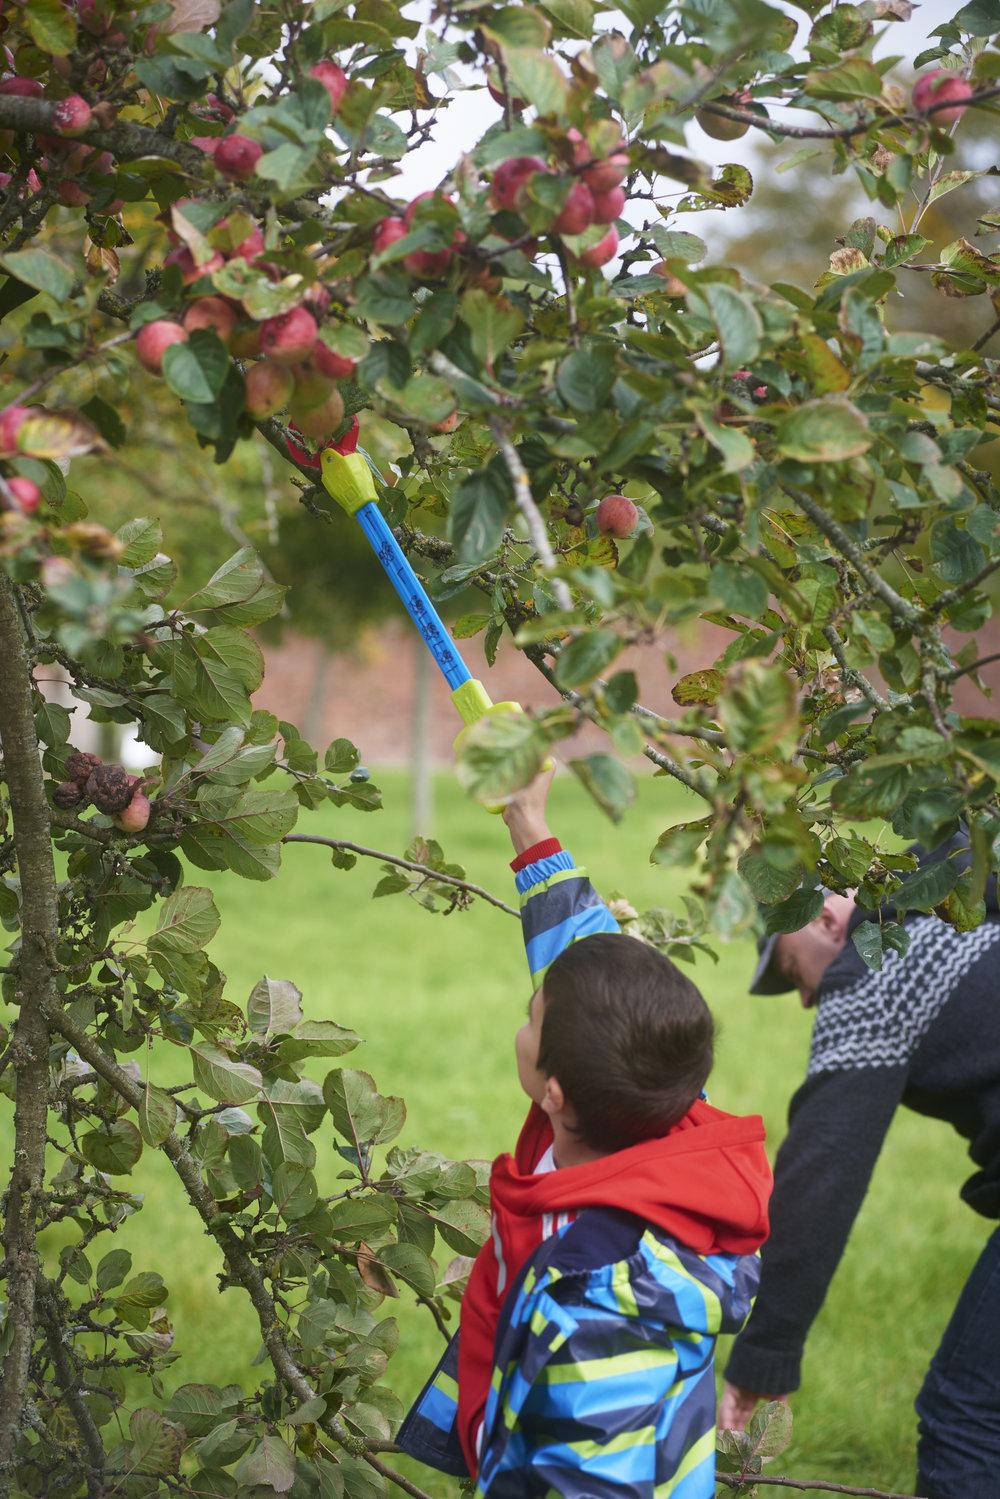 Apple days National Trust Images William Shaw.jpg